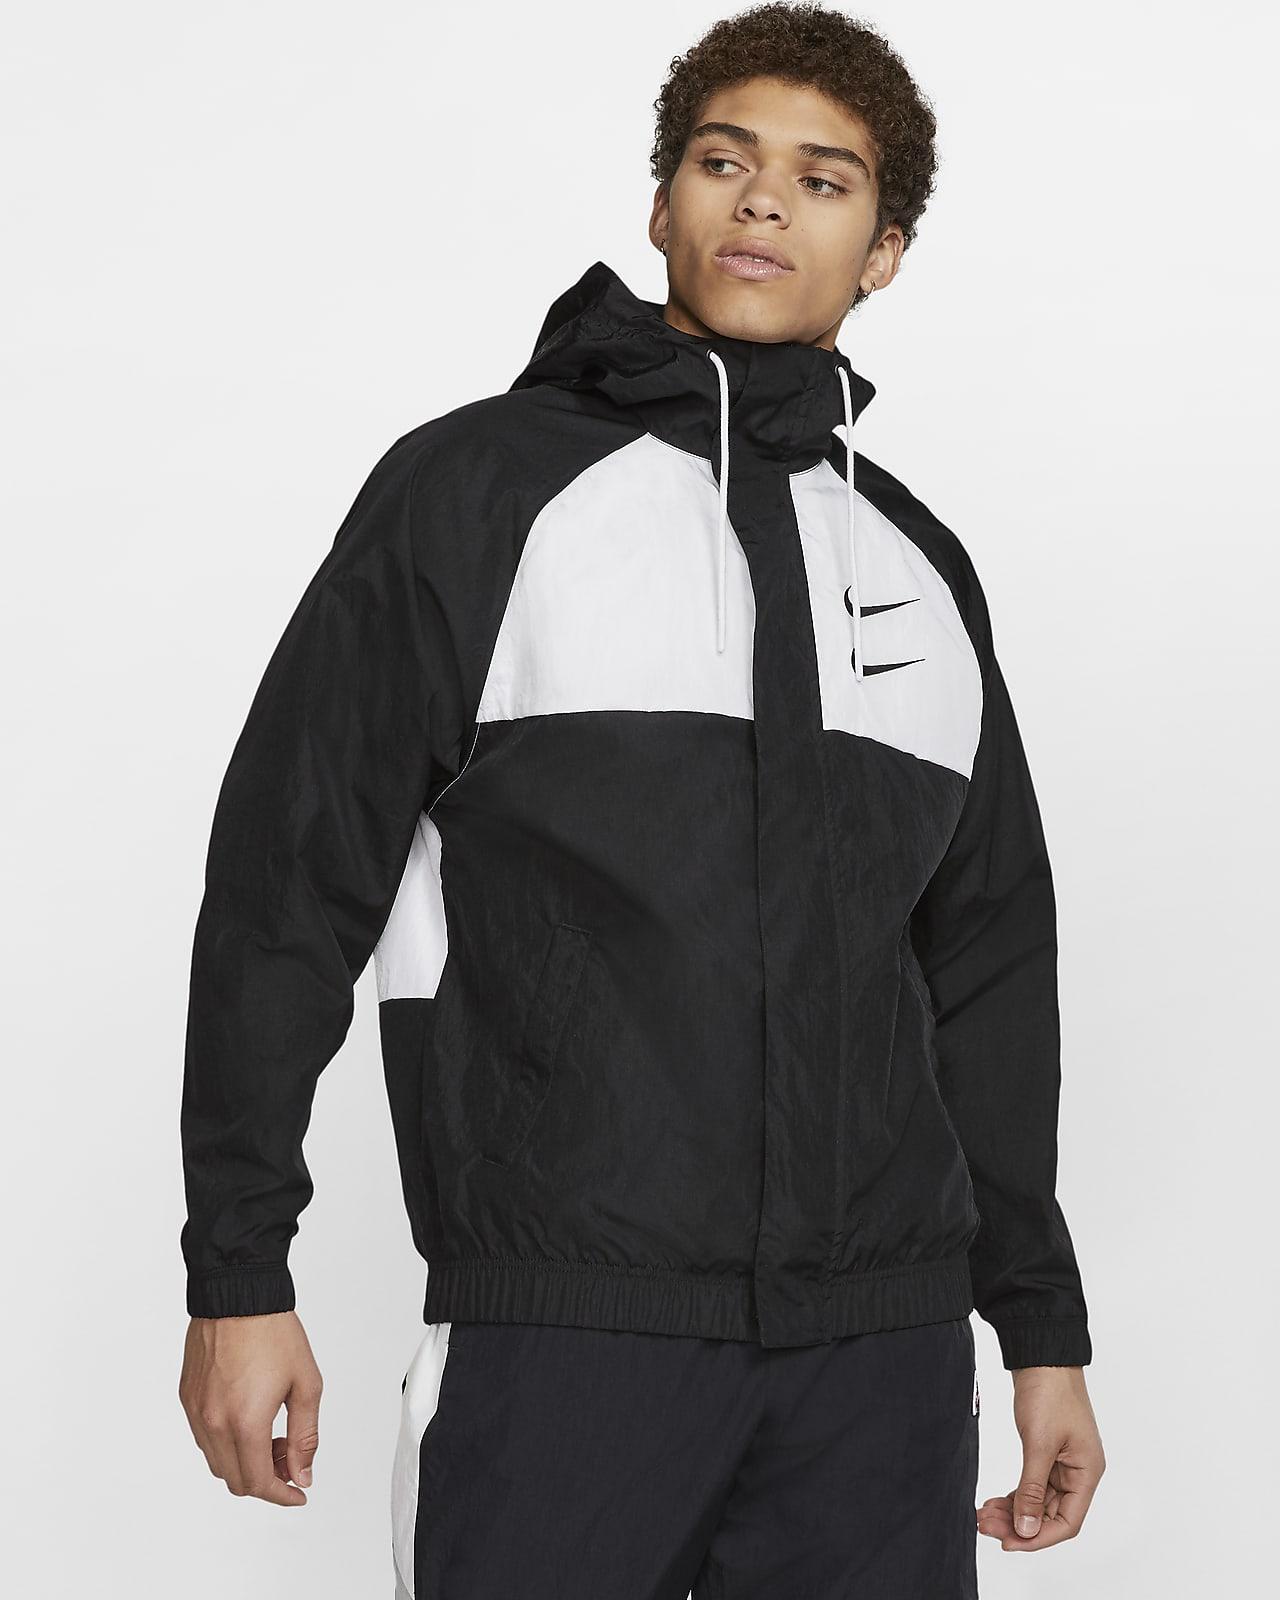 Vagabundo Pekkadillo ballena  Nike Sportswear Swoosh Chaqueta con capucha de tejido Woven - Hombre. Nike  ES